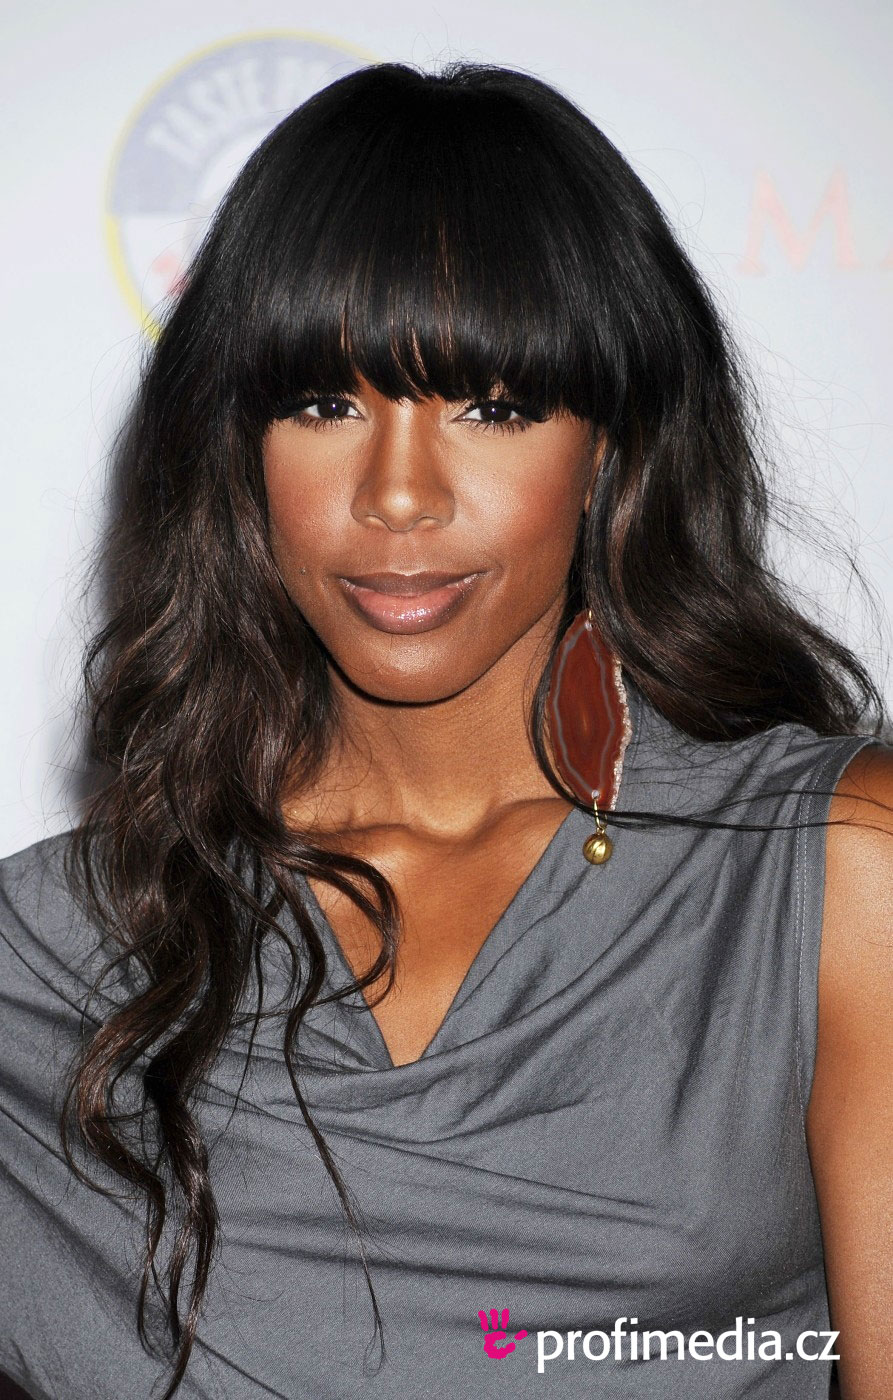 Prom hairstyle - Kelly Rowland - Kelly Rowland